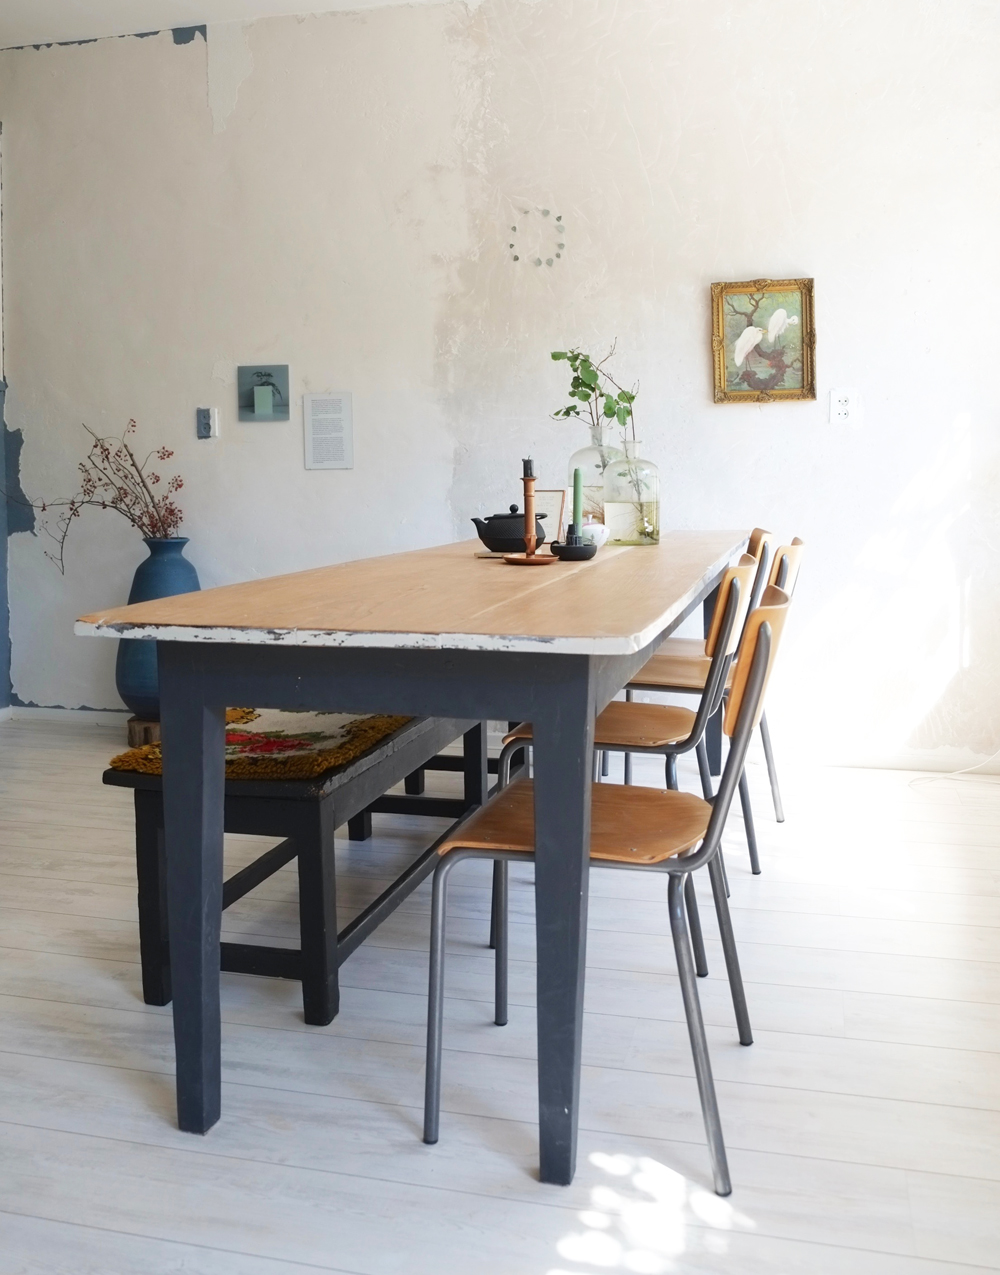 Pimpelwit-interieurontwerp-betonlook-3D-styling-makeover-woonkamer-keuken-betonmuur